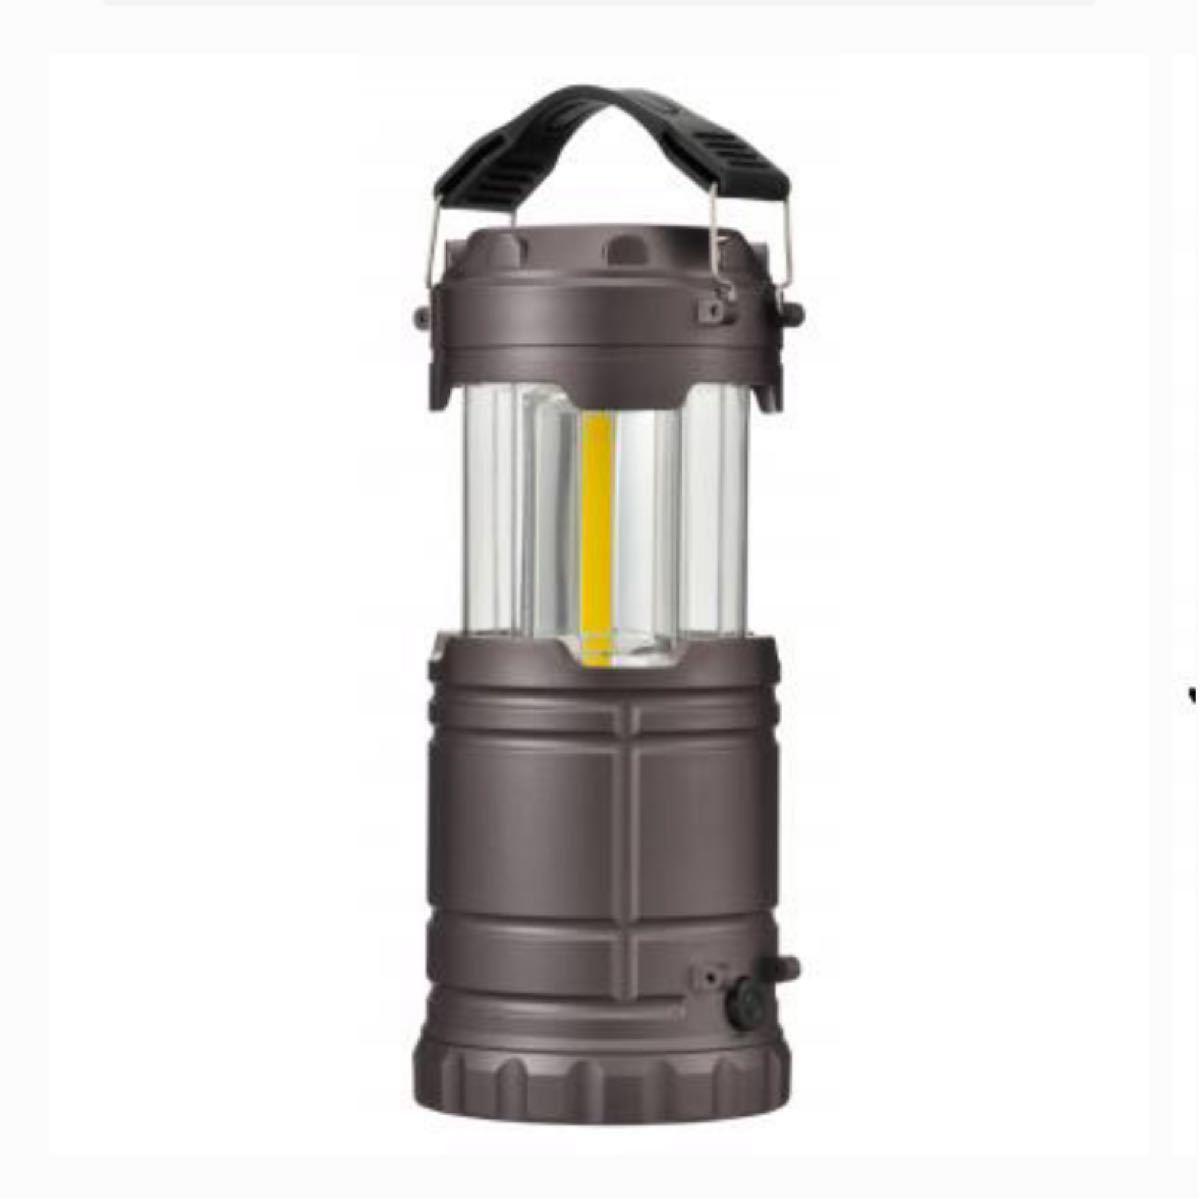 LEDランタン キャンプランタン 電池式